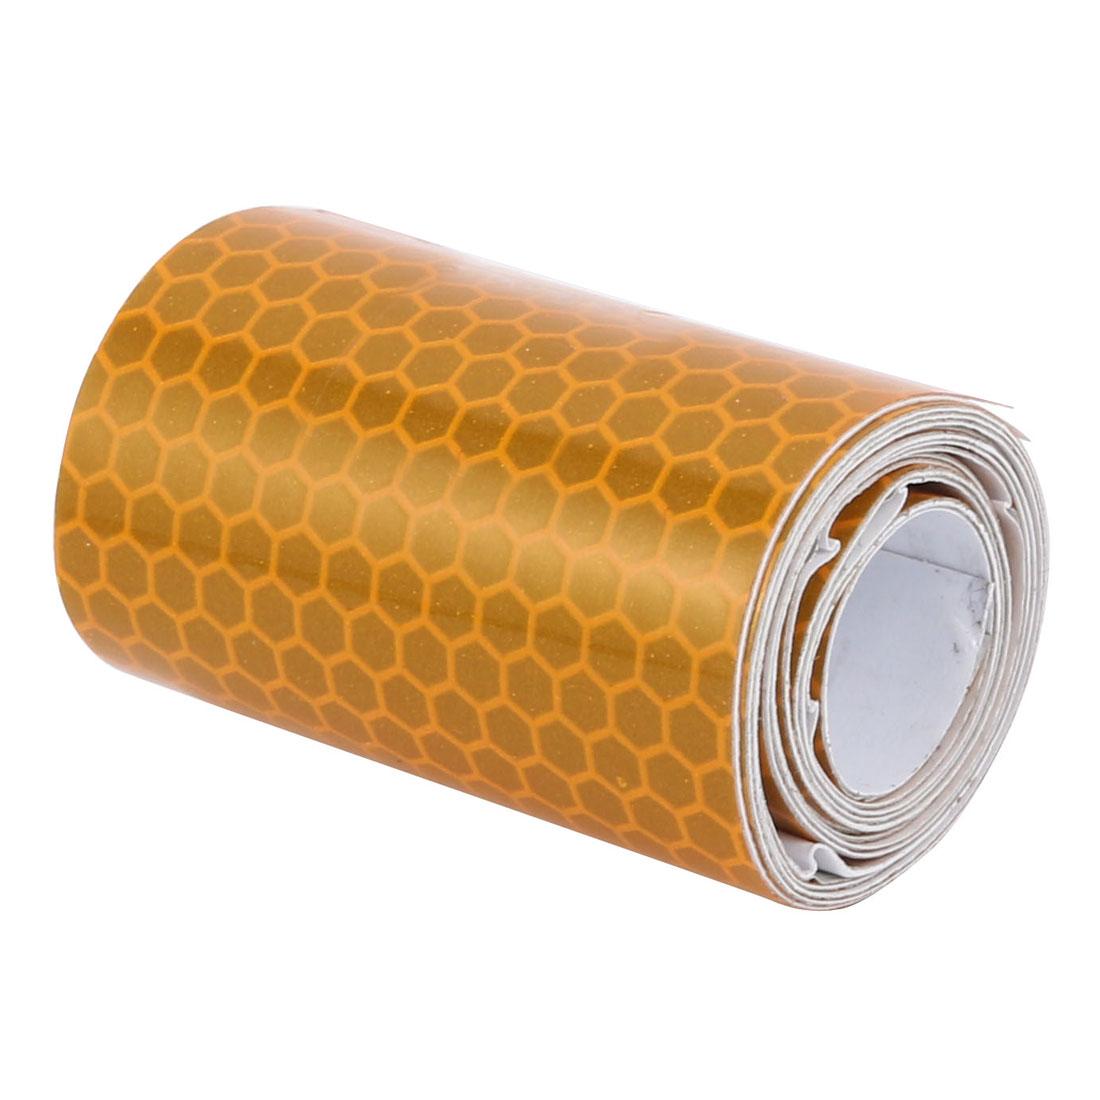 1M Long 5cm Width Honeycomb Single Sided Adhesive Reflective Warning Tape Yellow